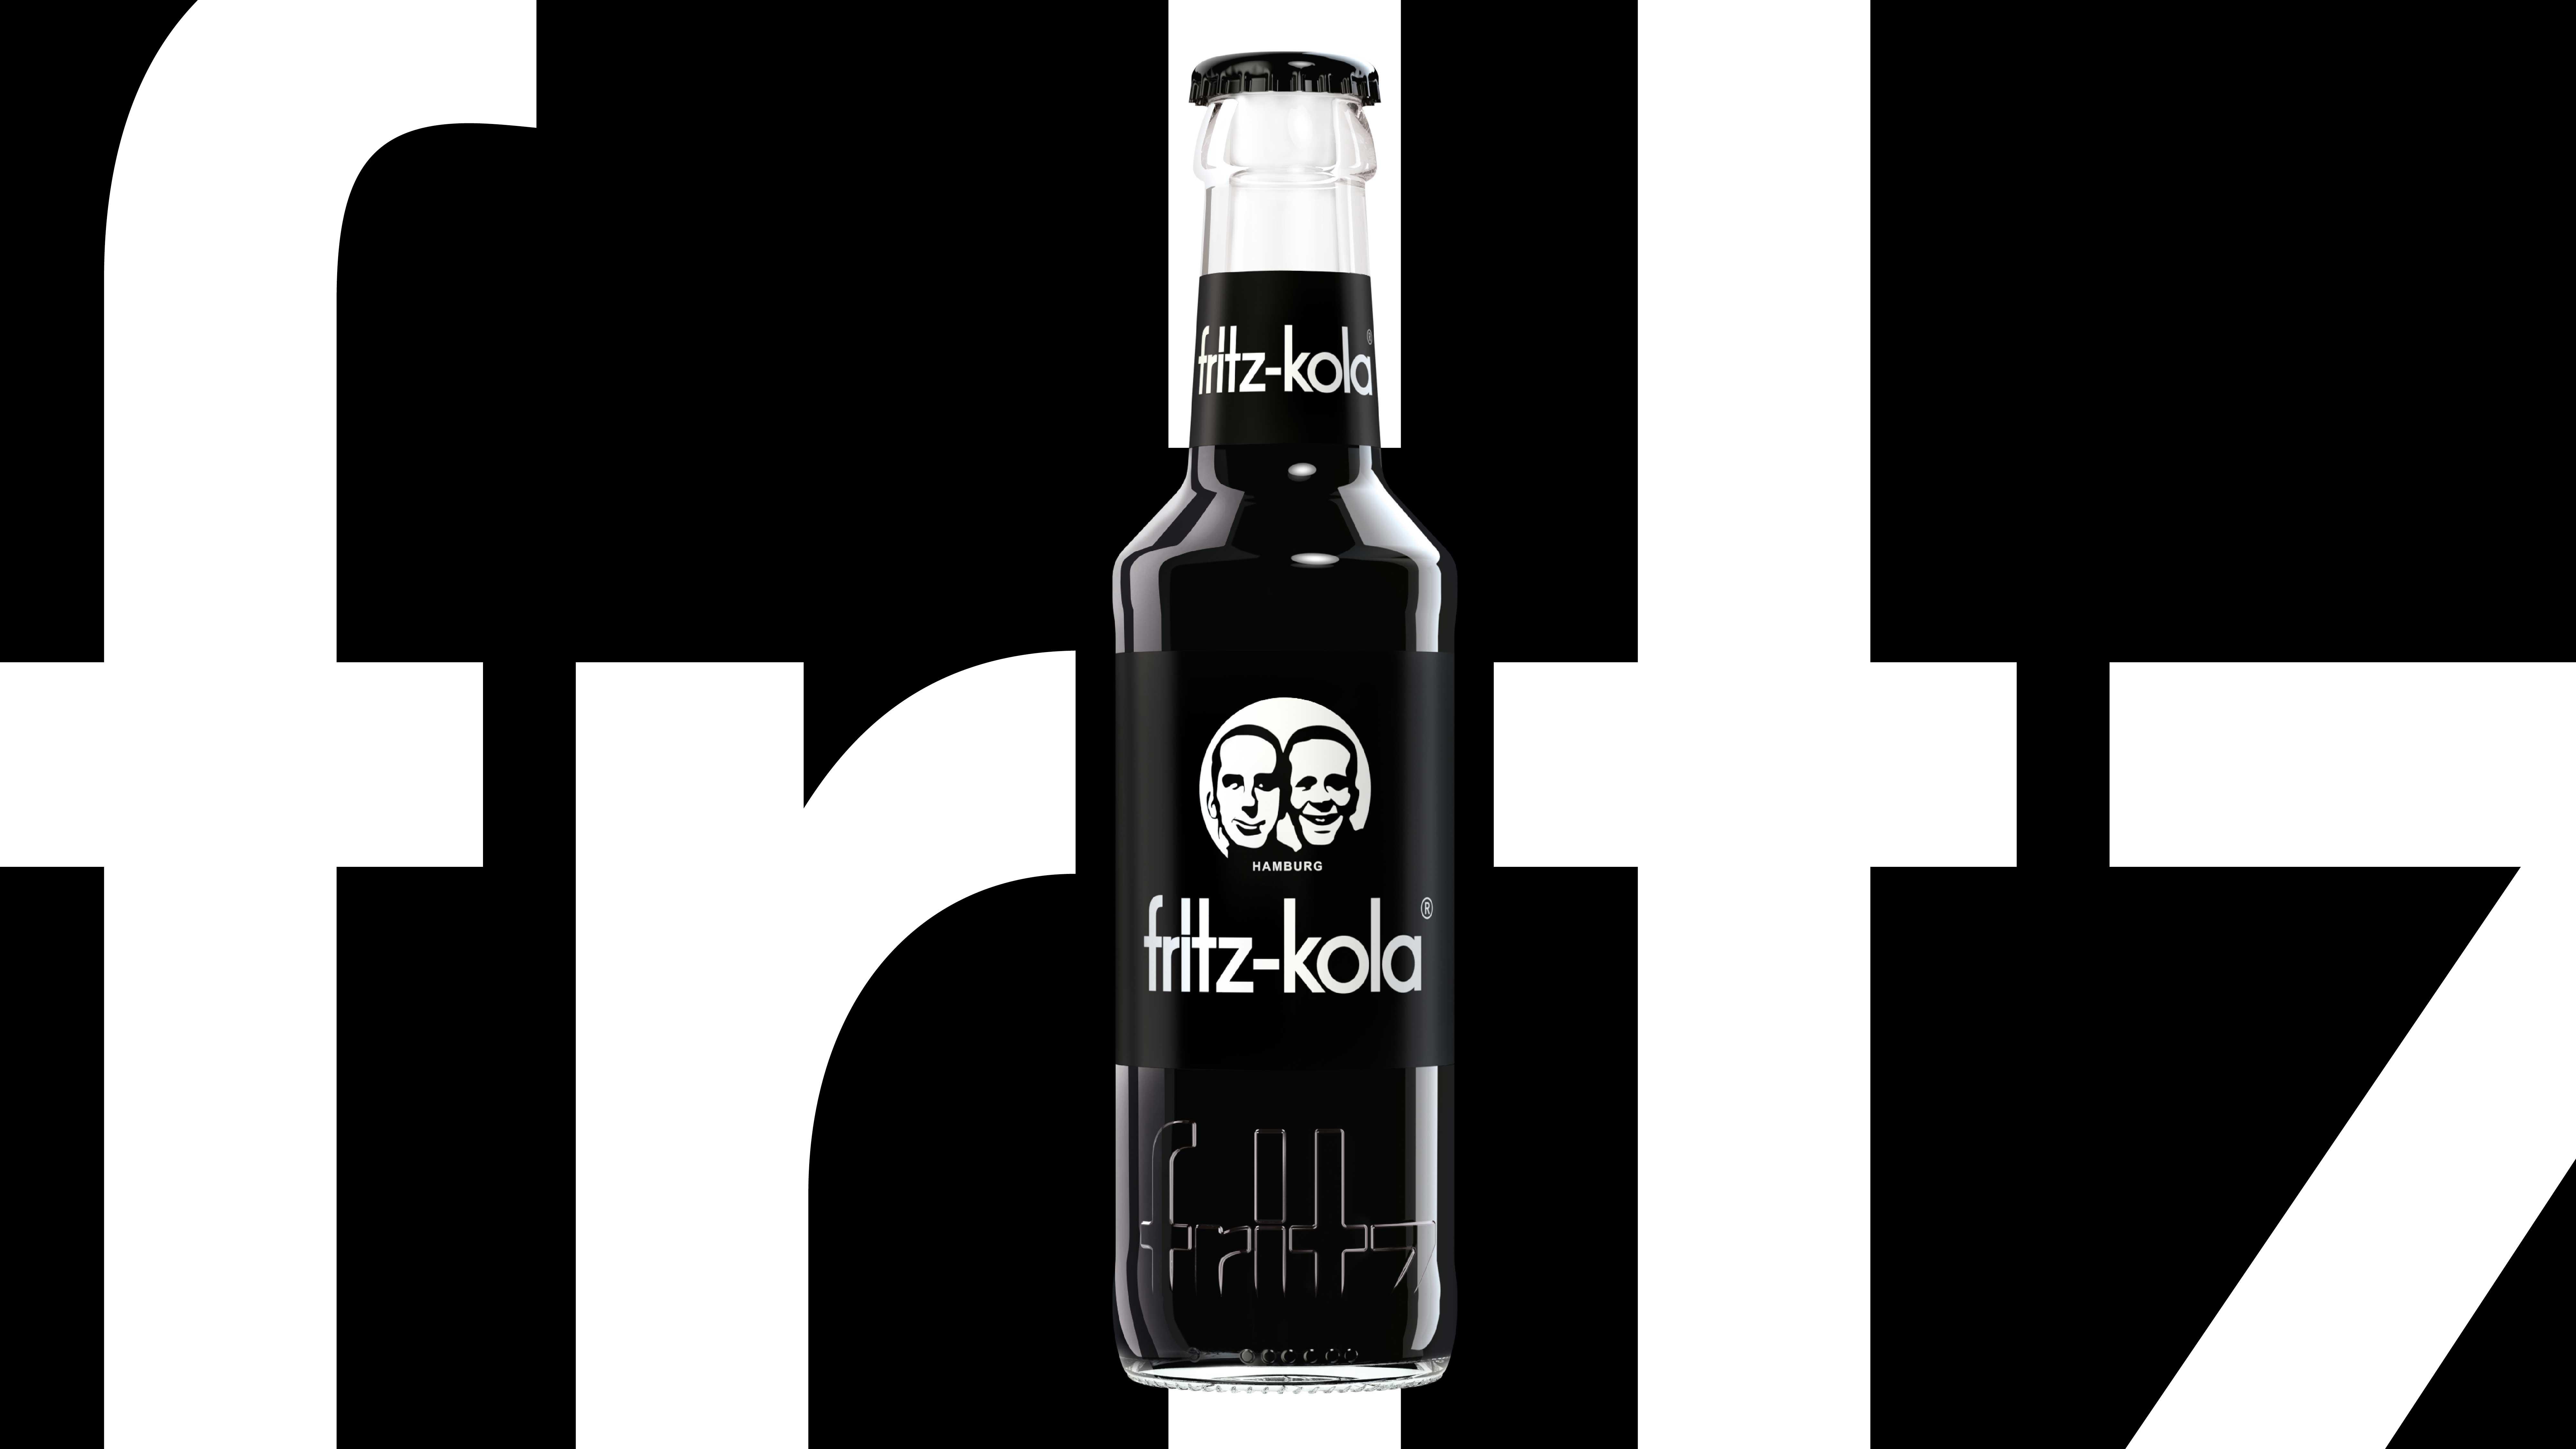 Superunion Casts Fritz-Kola Brand Attitude in a Glass